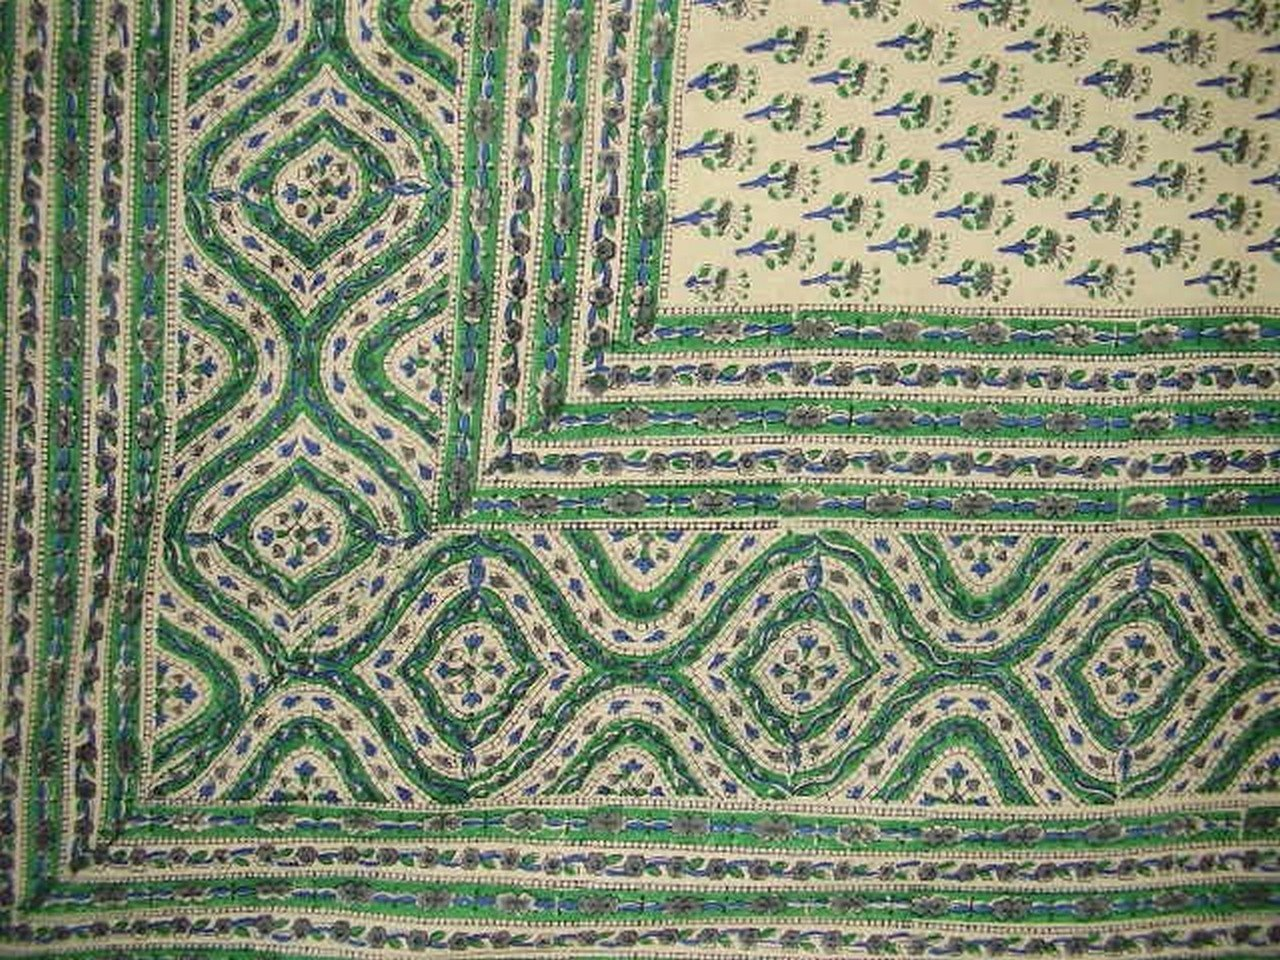 Block Print Indian Tapestry Cotton Bedspread 108'' x 88'' Full-Queen Green